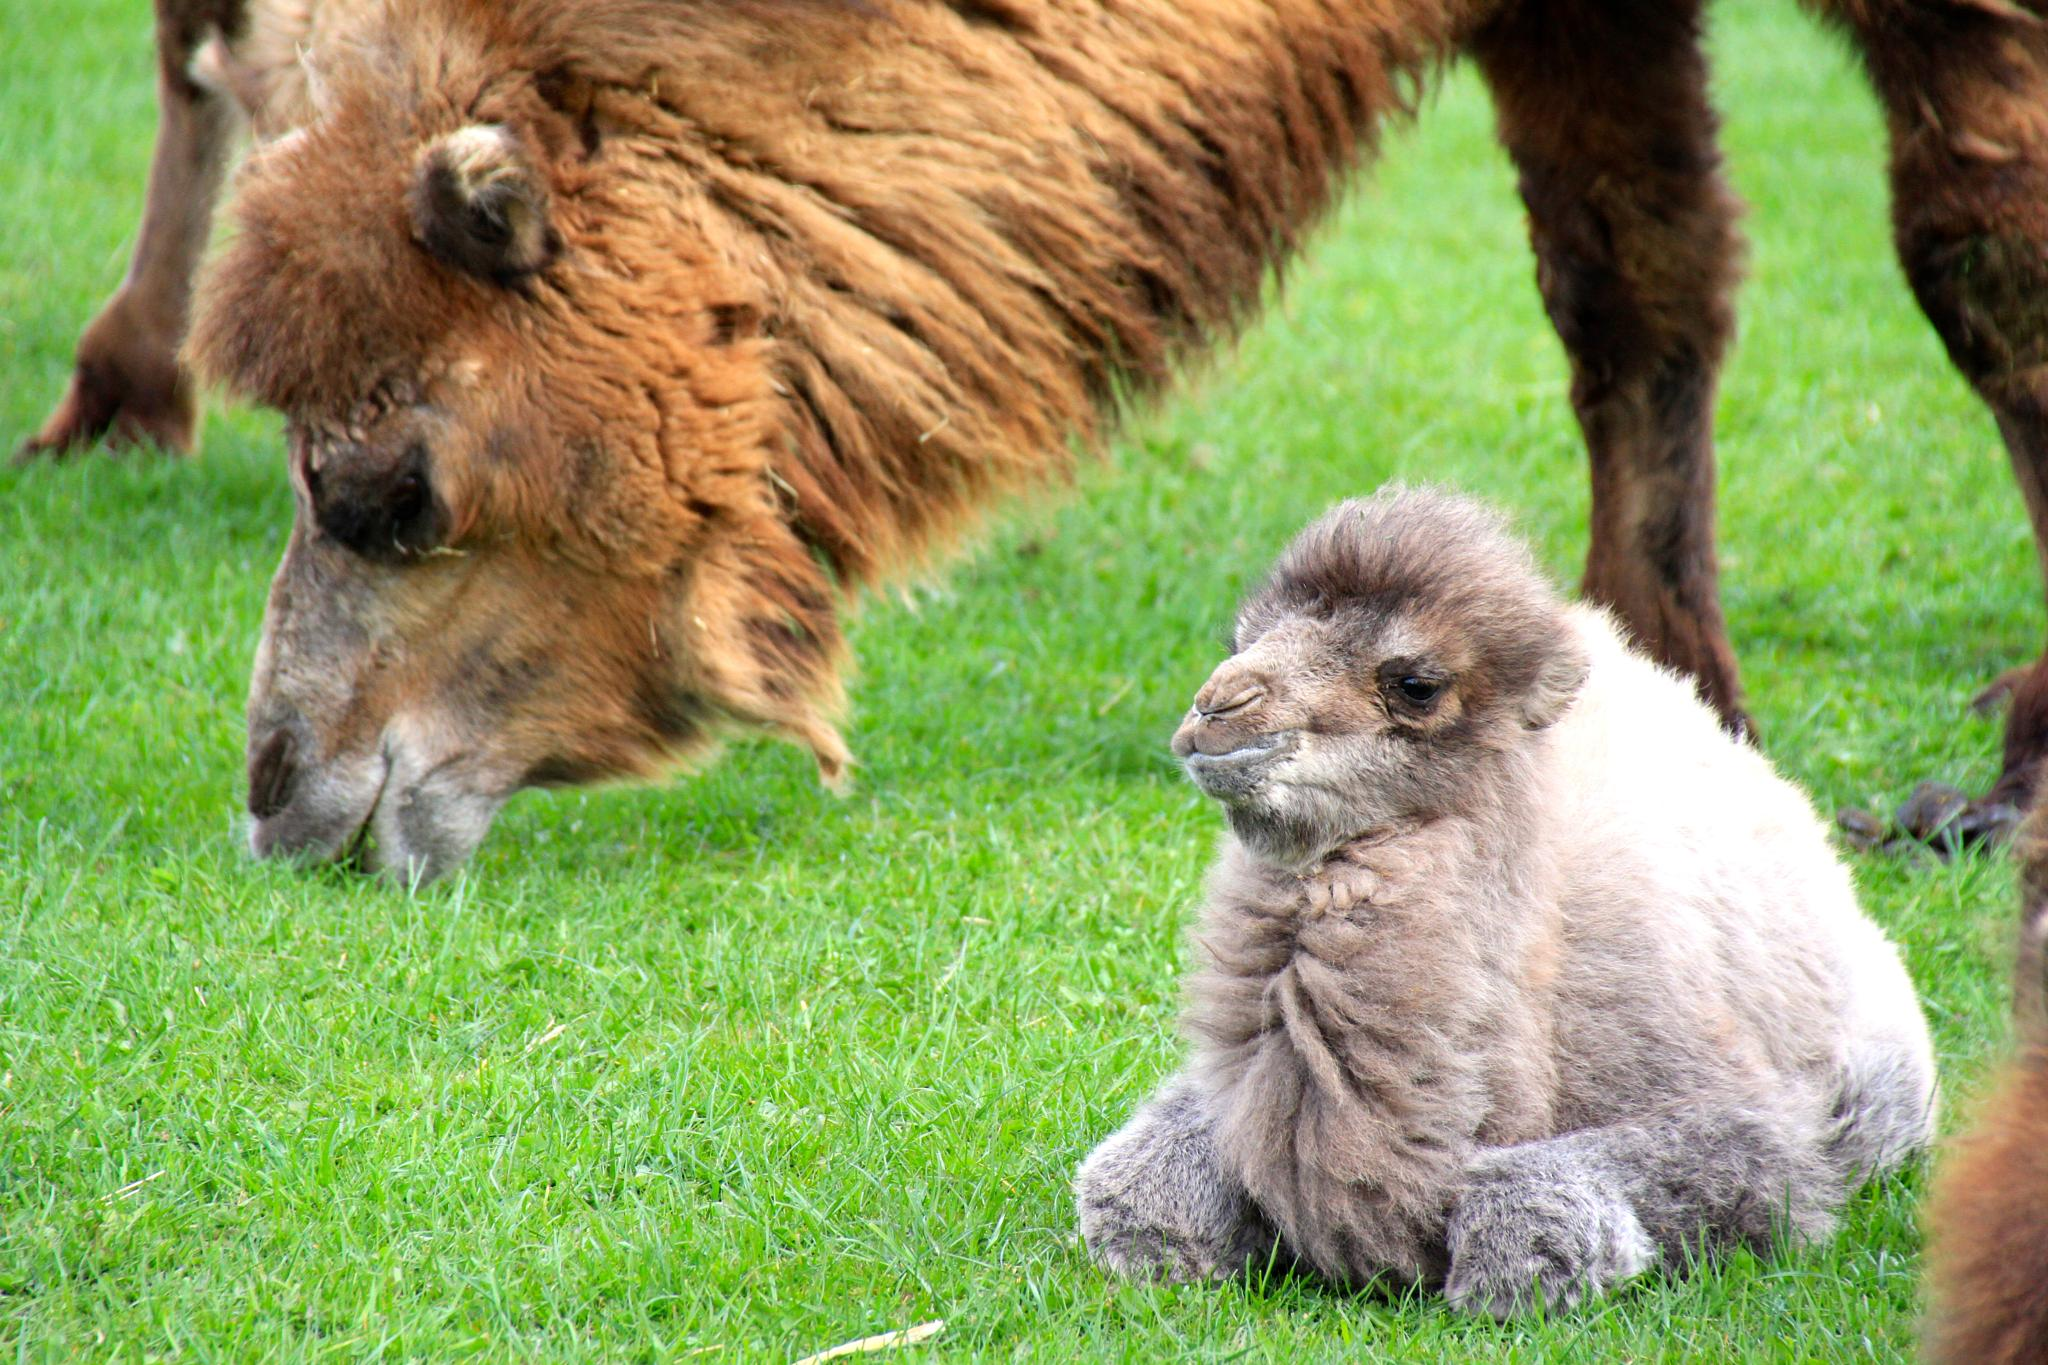 Baby Camel by Martin Roper